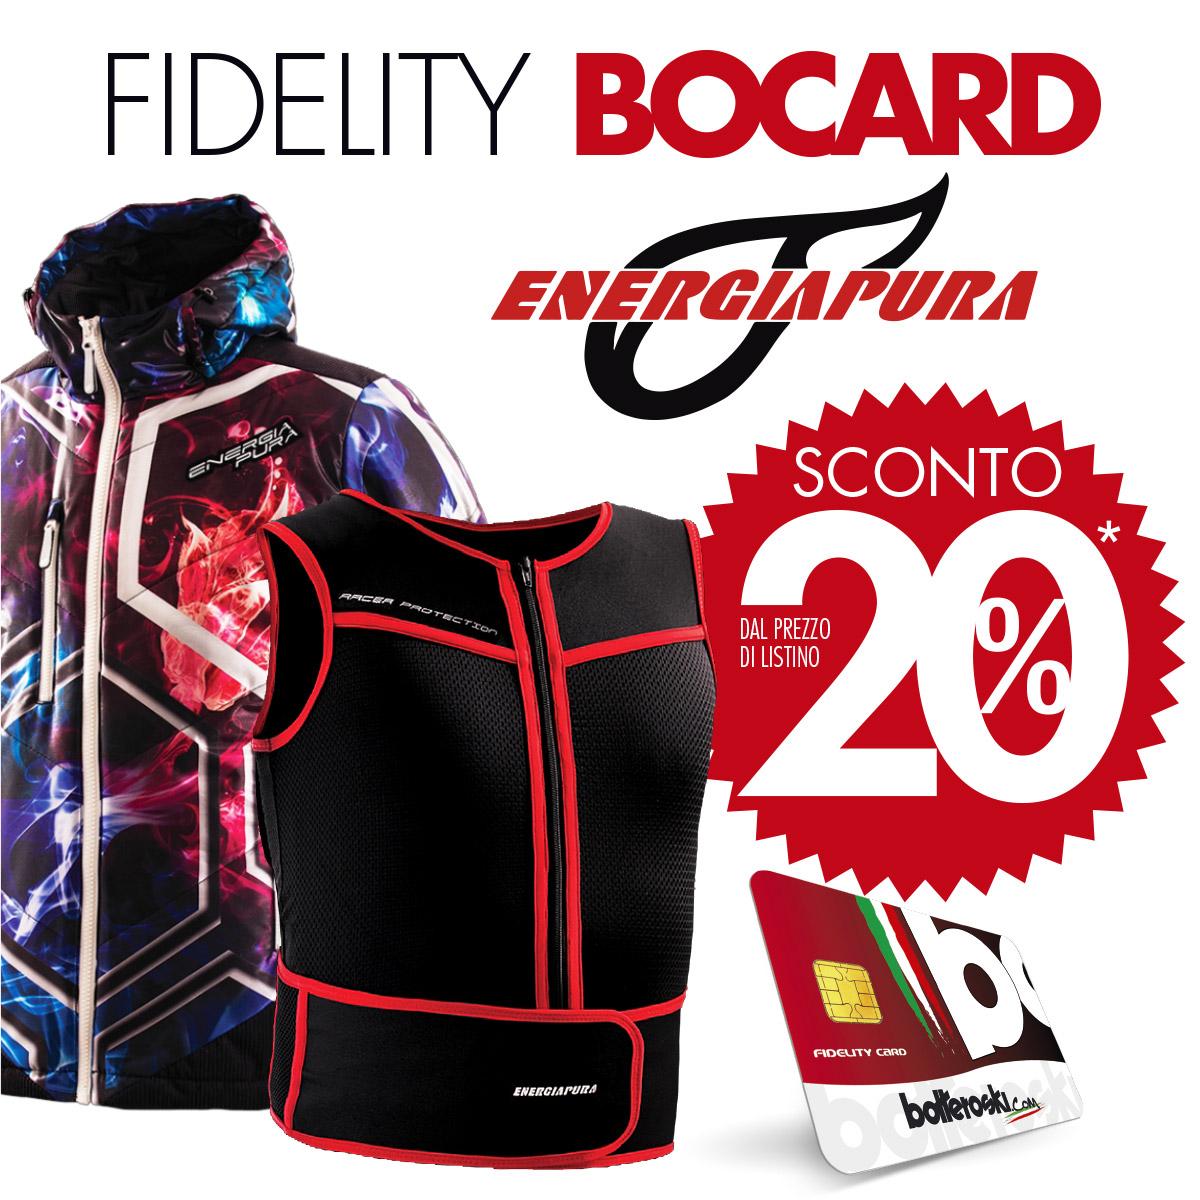 Promo-LIMONE_ENERGIAPURA-BOCARD_Sconto20_BannerNewsletter